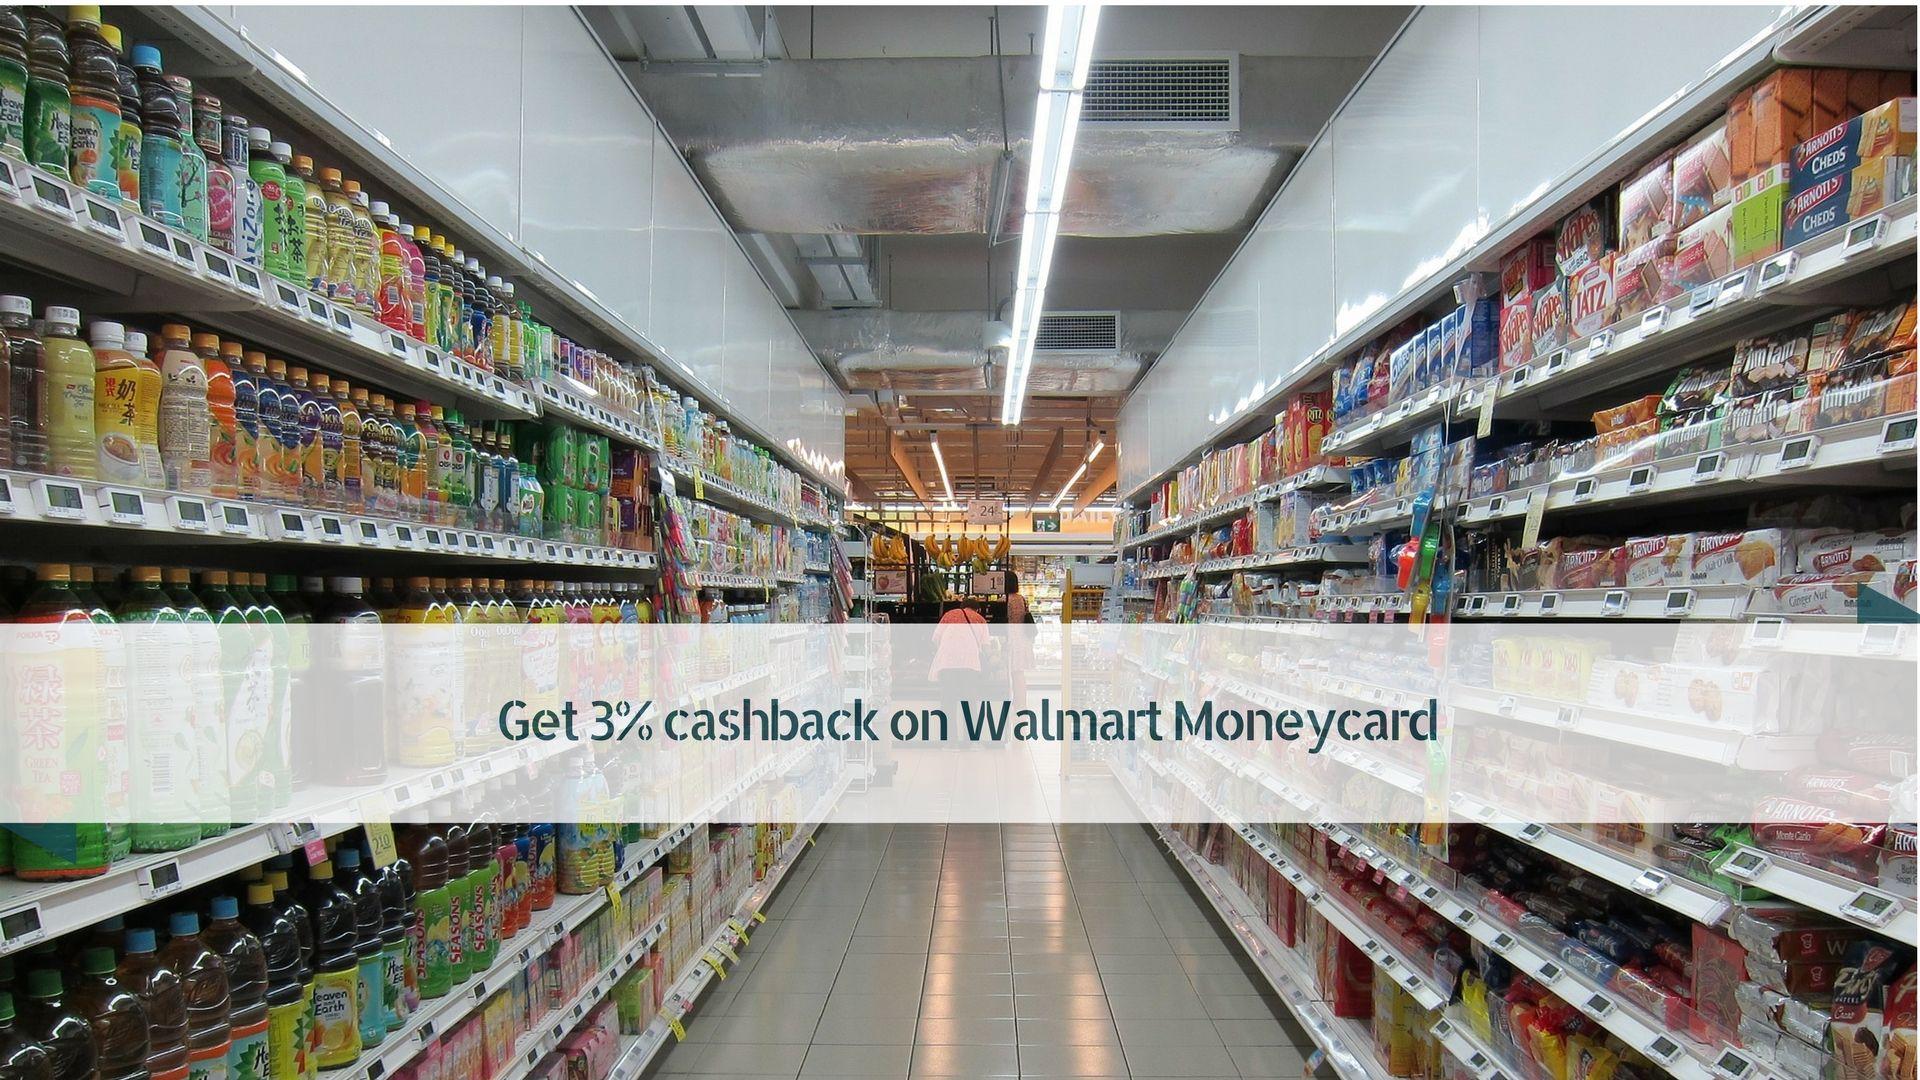 Walmart Moneycard